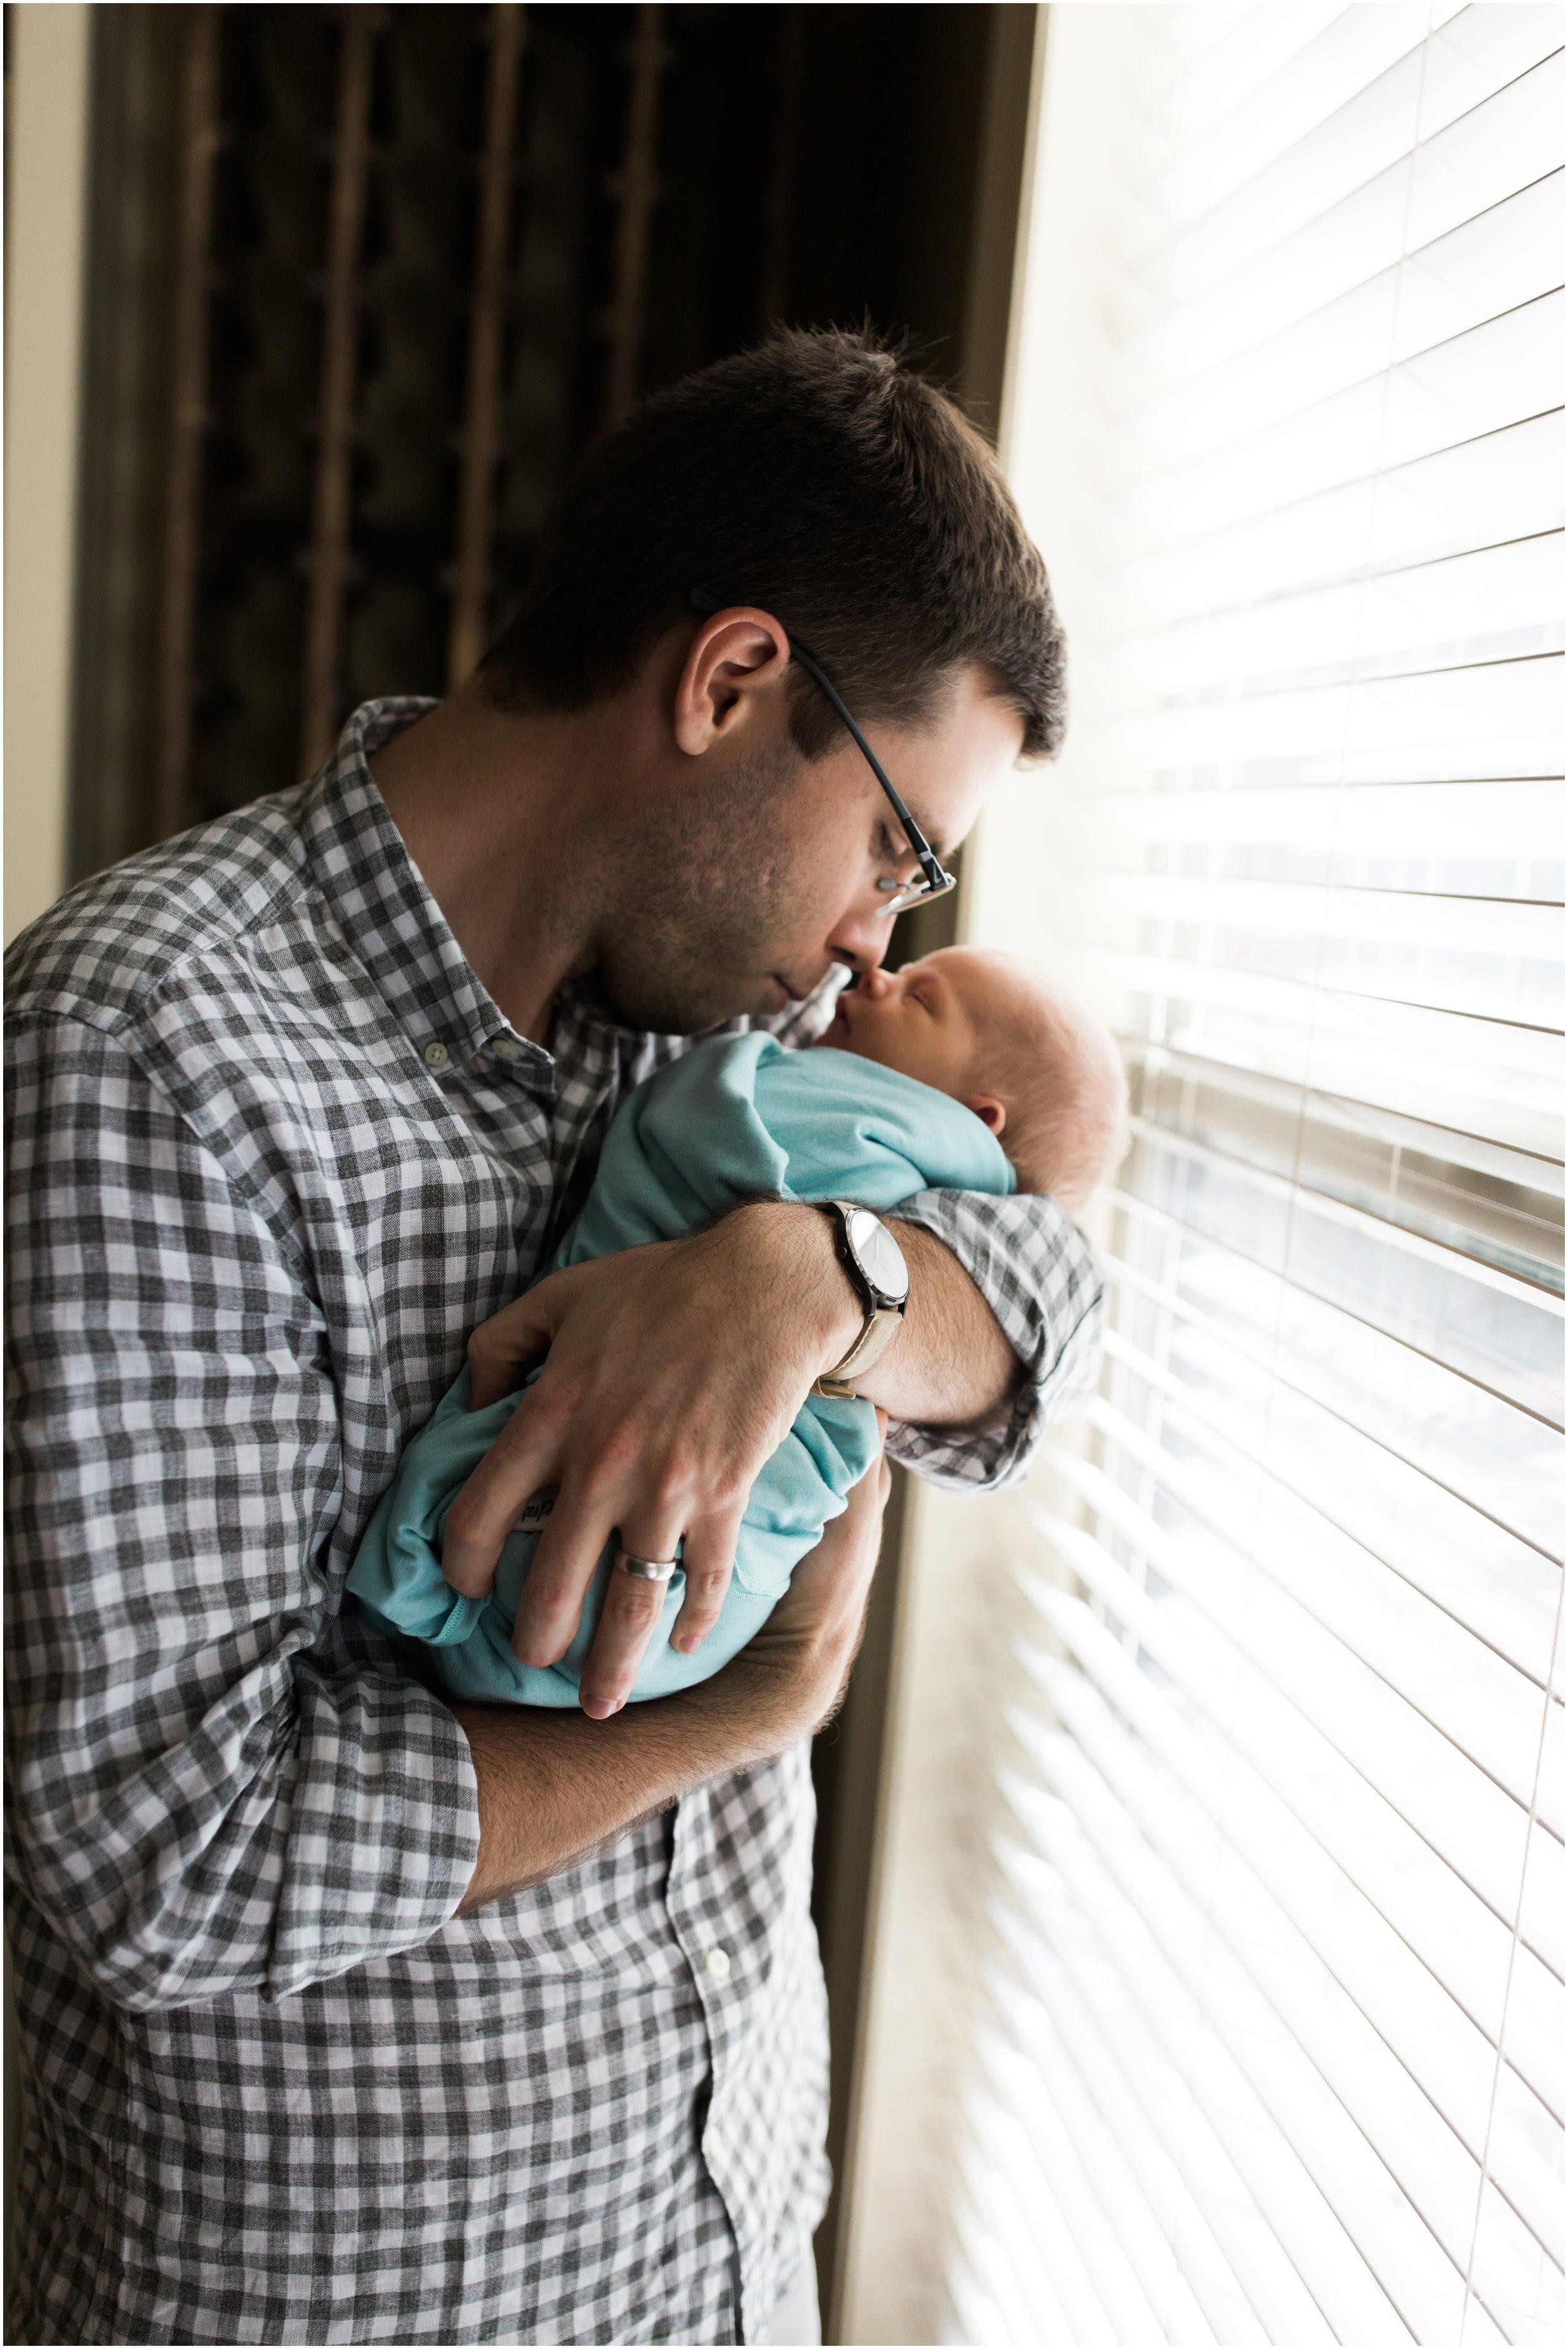 Aldrige-Family-2017-August-130_quaint-and-whim-lifestyle-newborn-photographer-louisiana-aldrige-family-.jpg